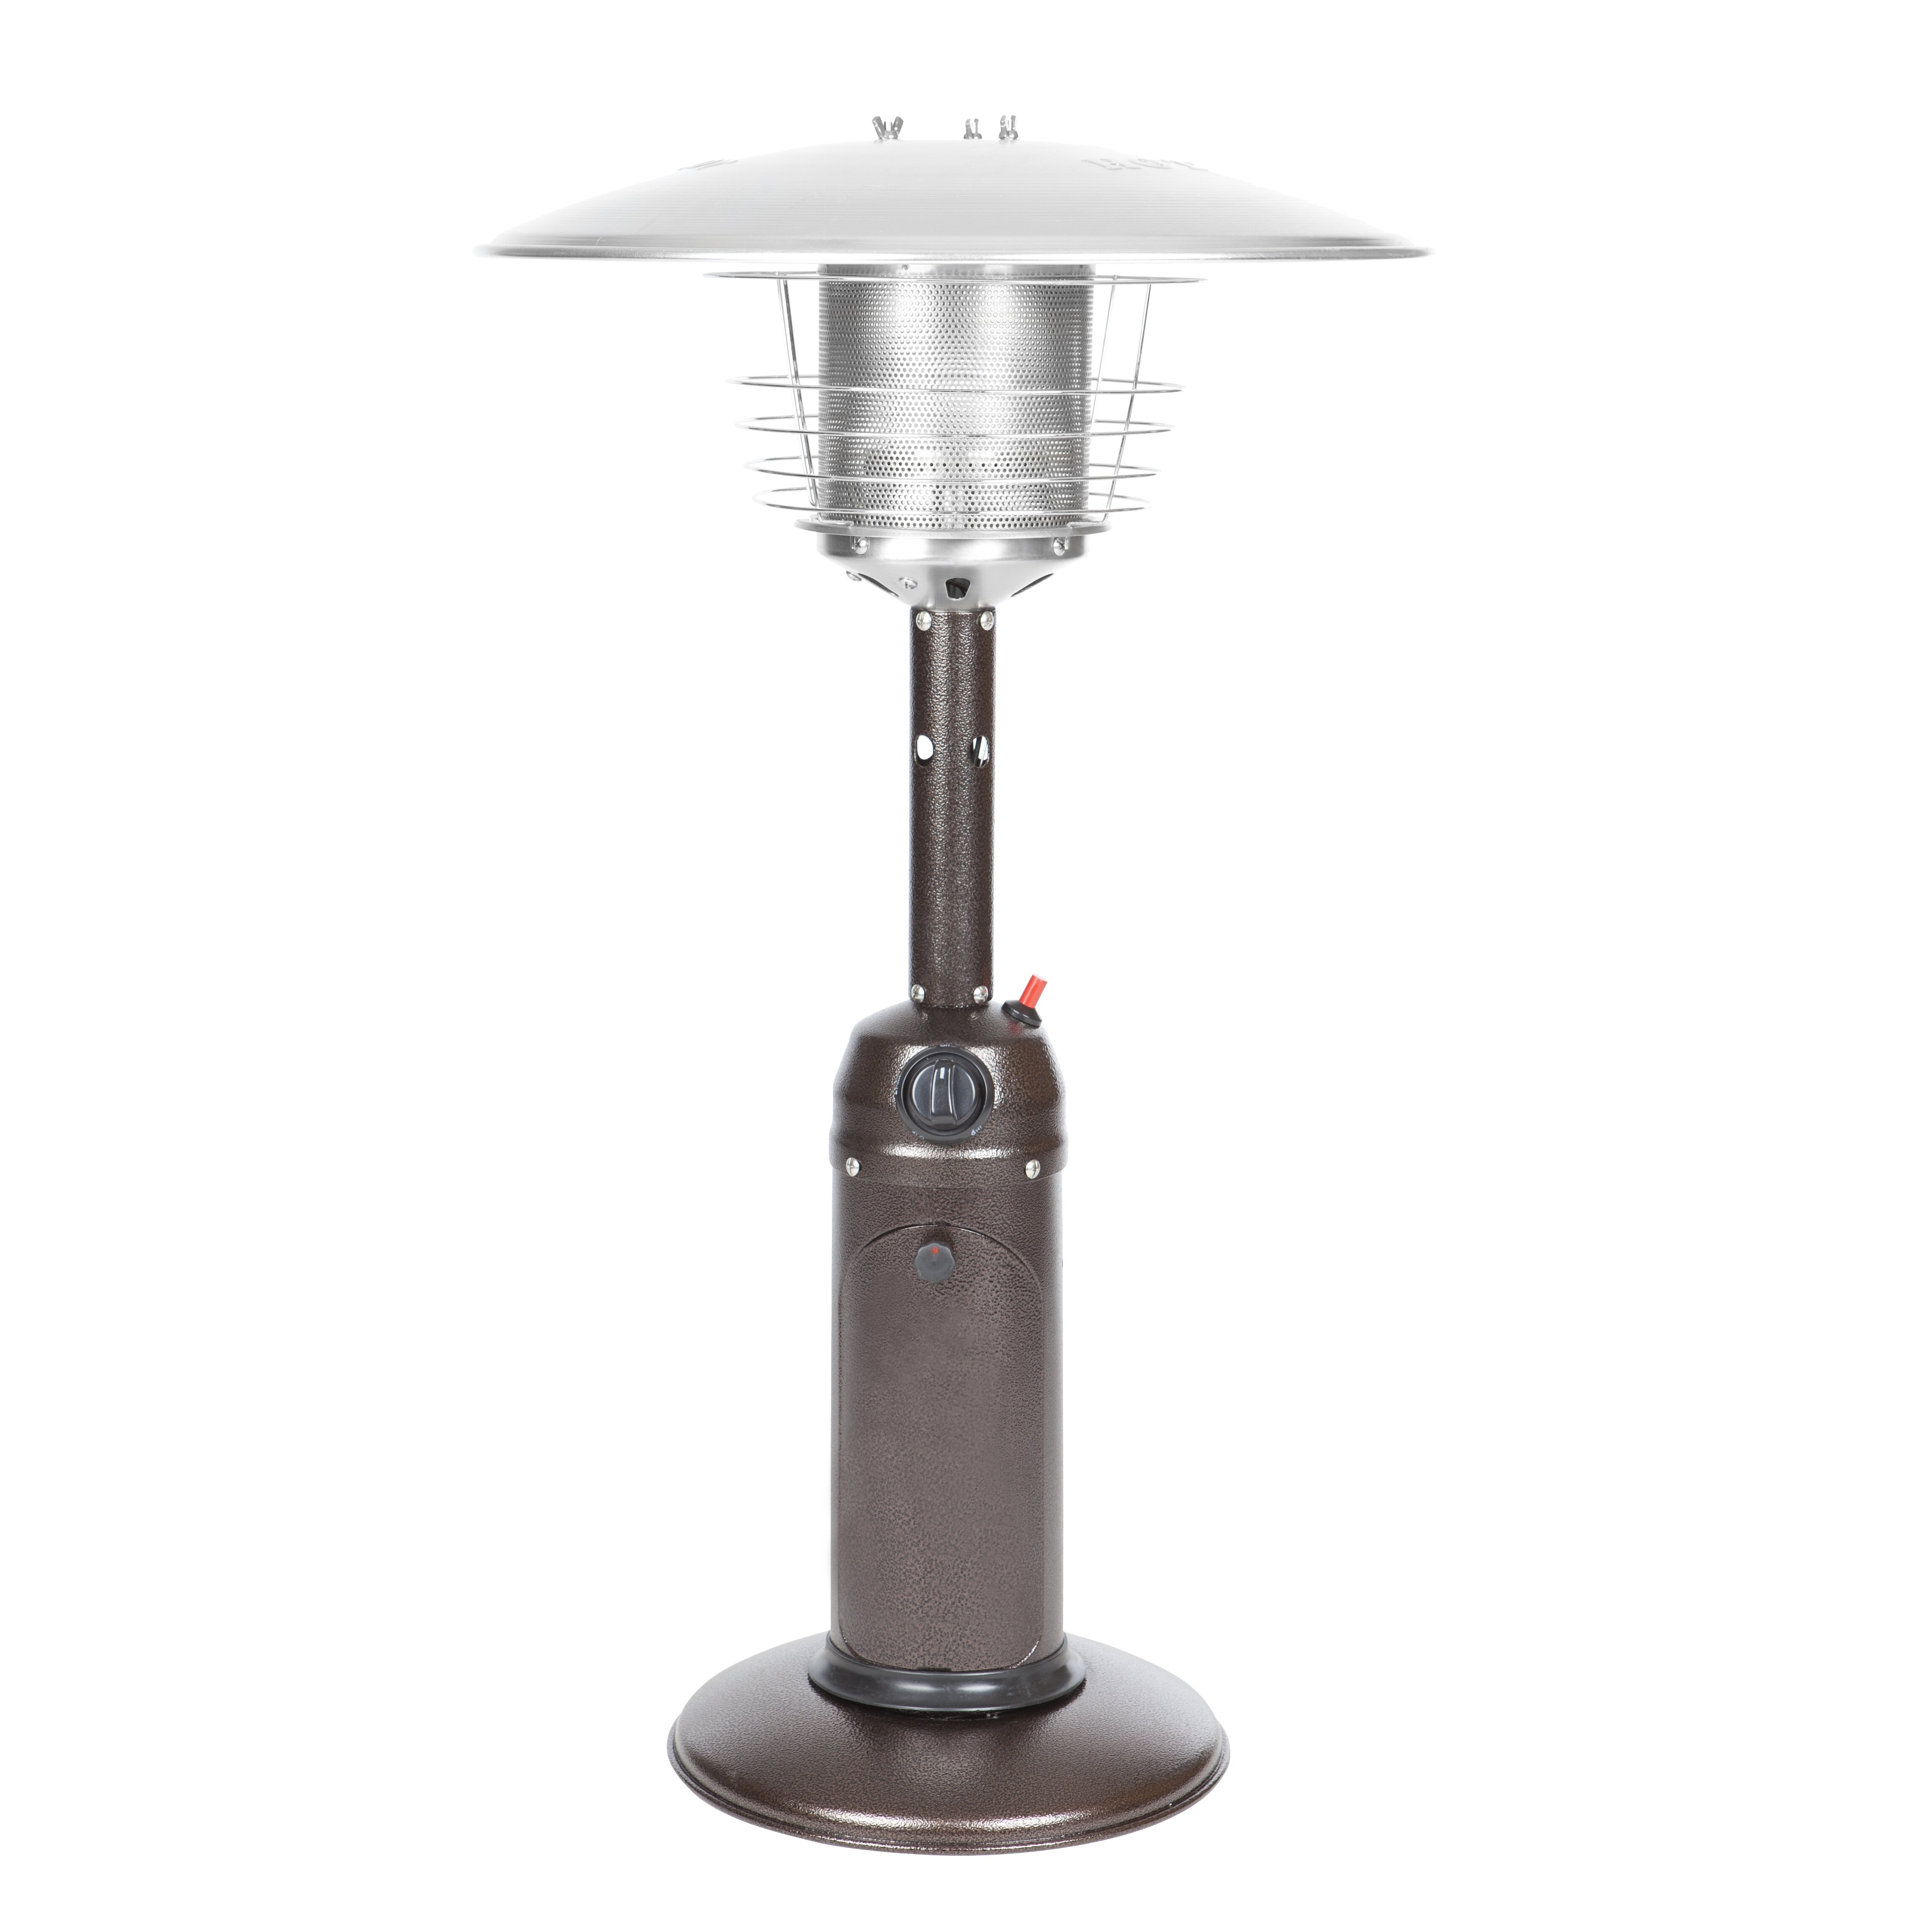 Fire sense tabletop propane patio heater reviews wayfair for Tabletop patio heater reviews